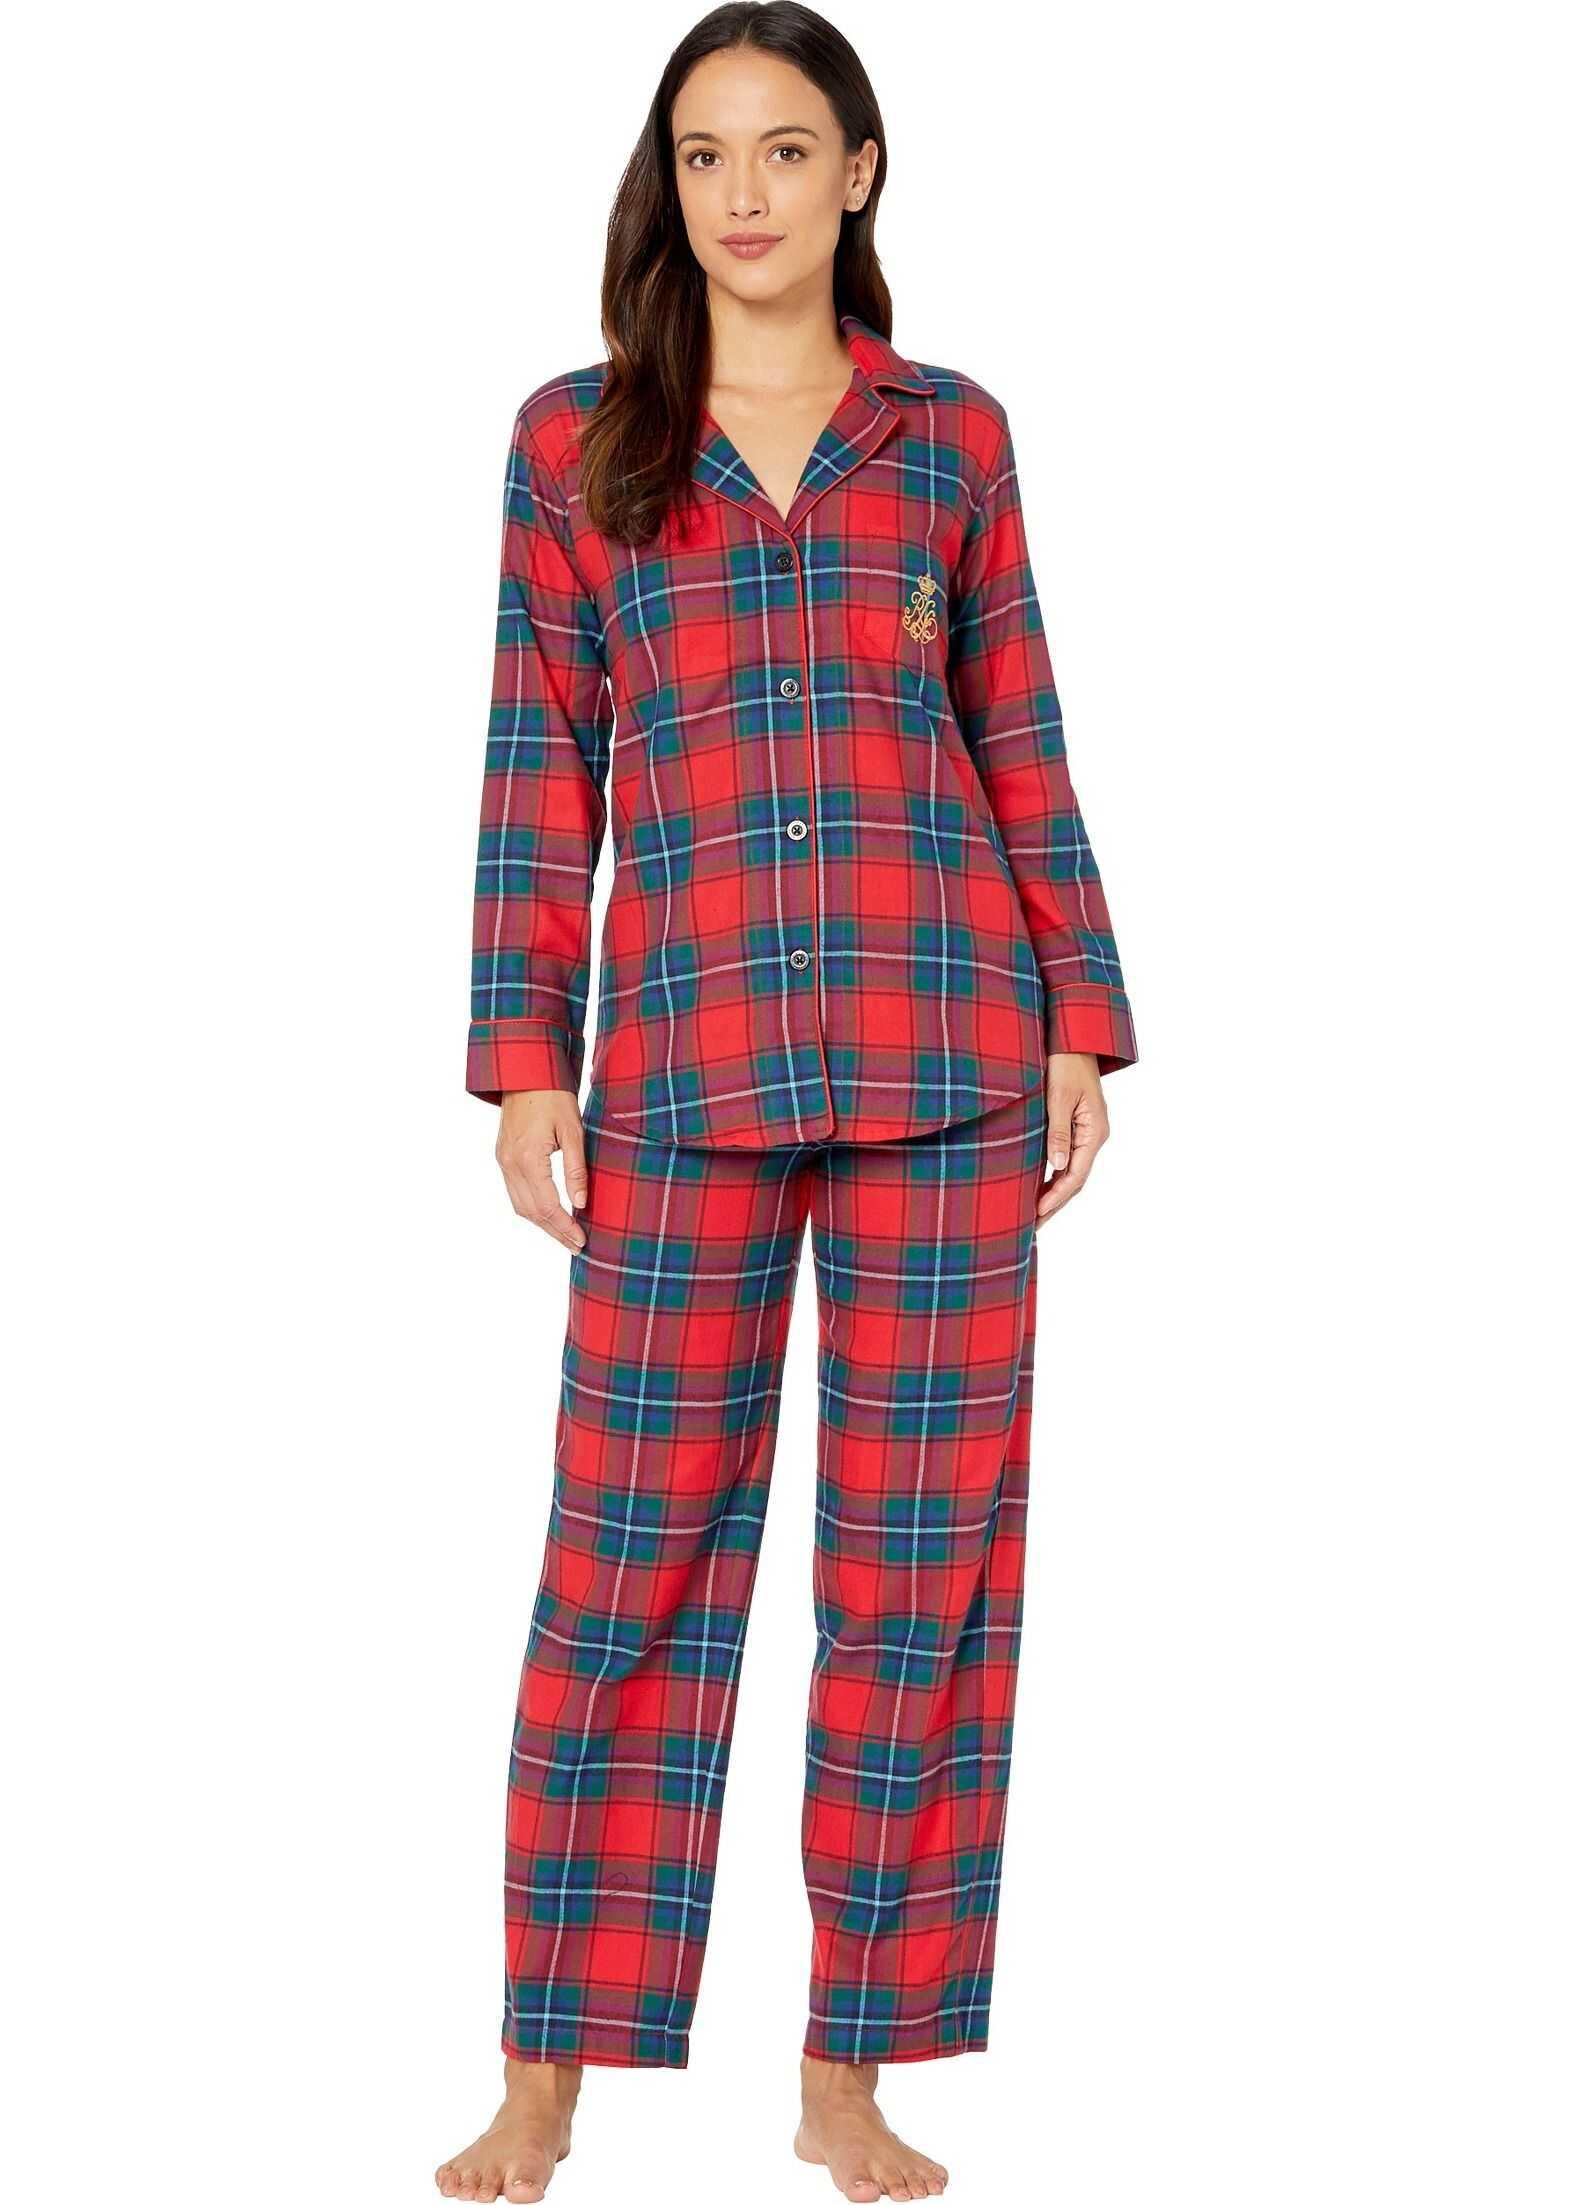 Ralph Lauren Petite Brushed Twill Long Sleeve Notch Collar Long Pants Pajama Set Red Plaid